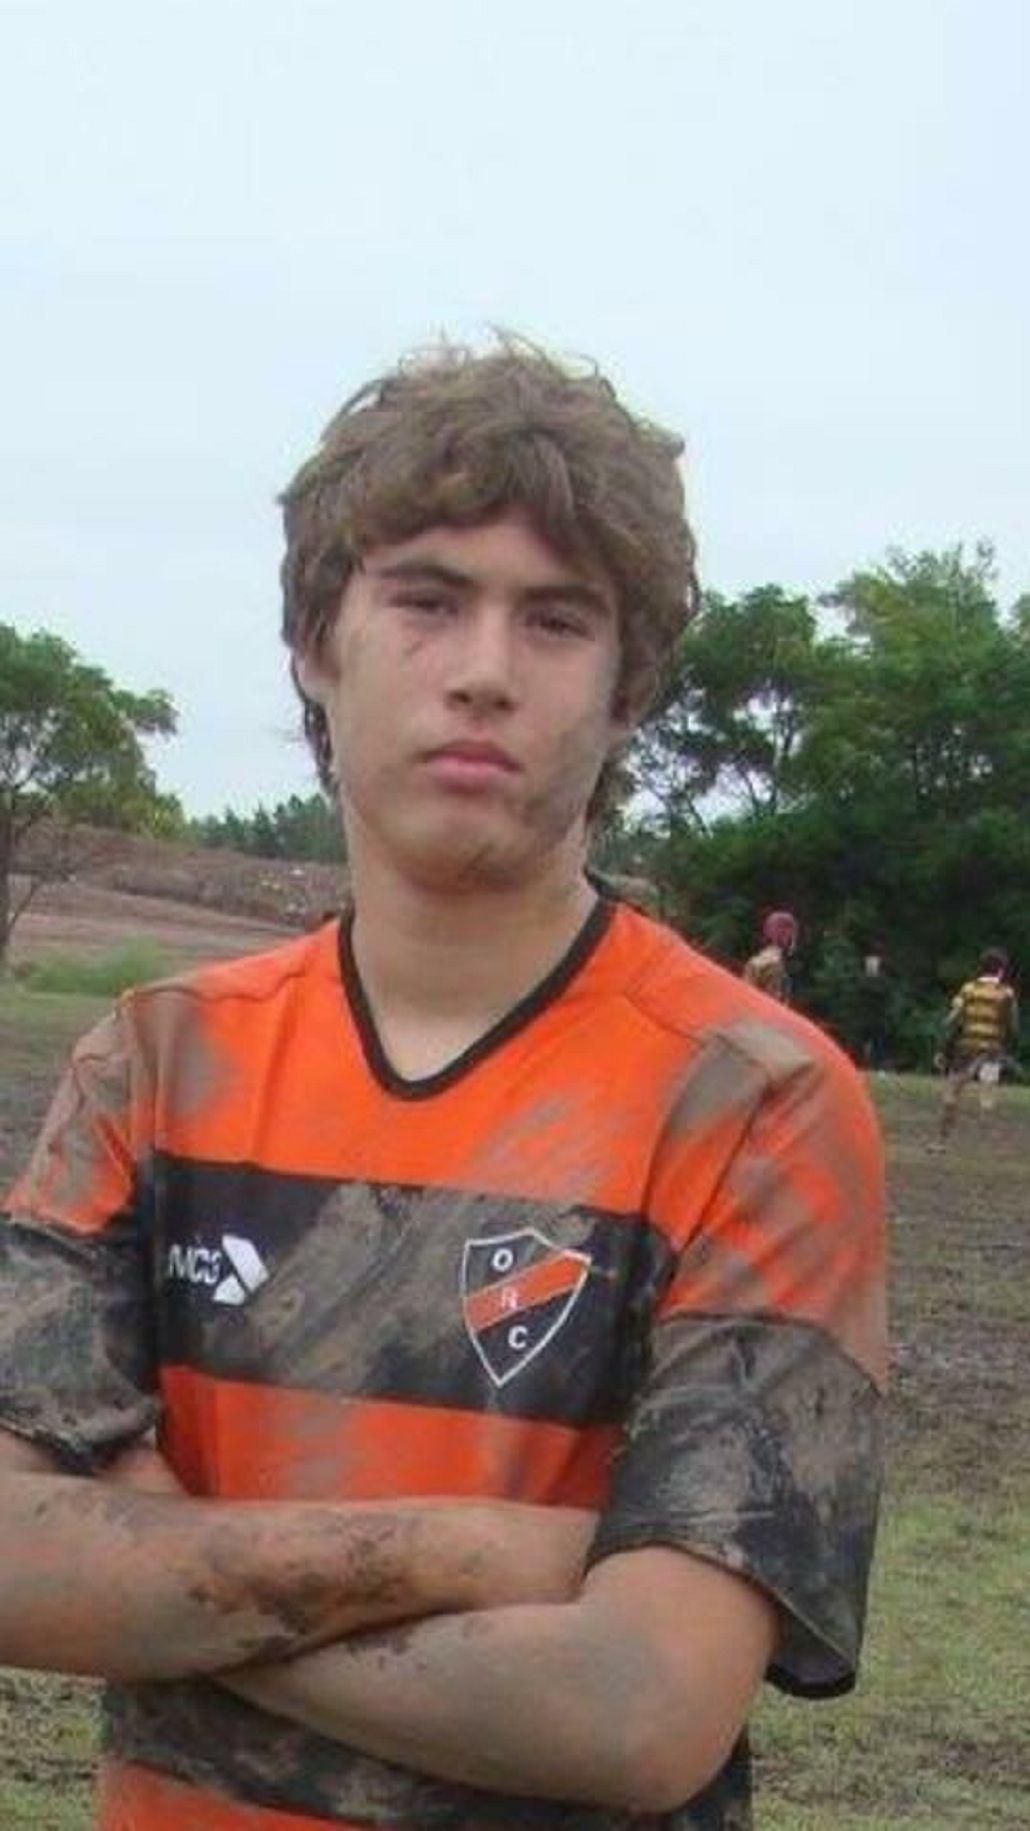 Familia desesperada busca a un joven de 14 años que desapareció este martes